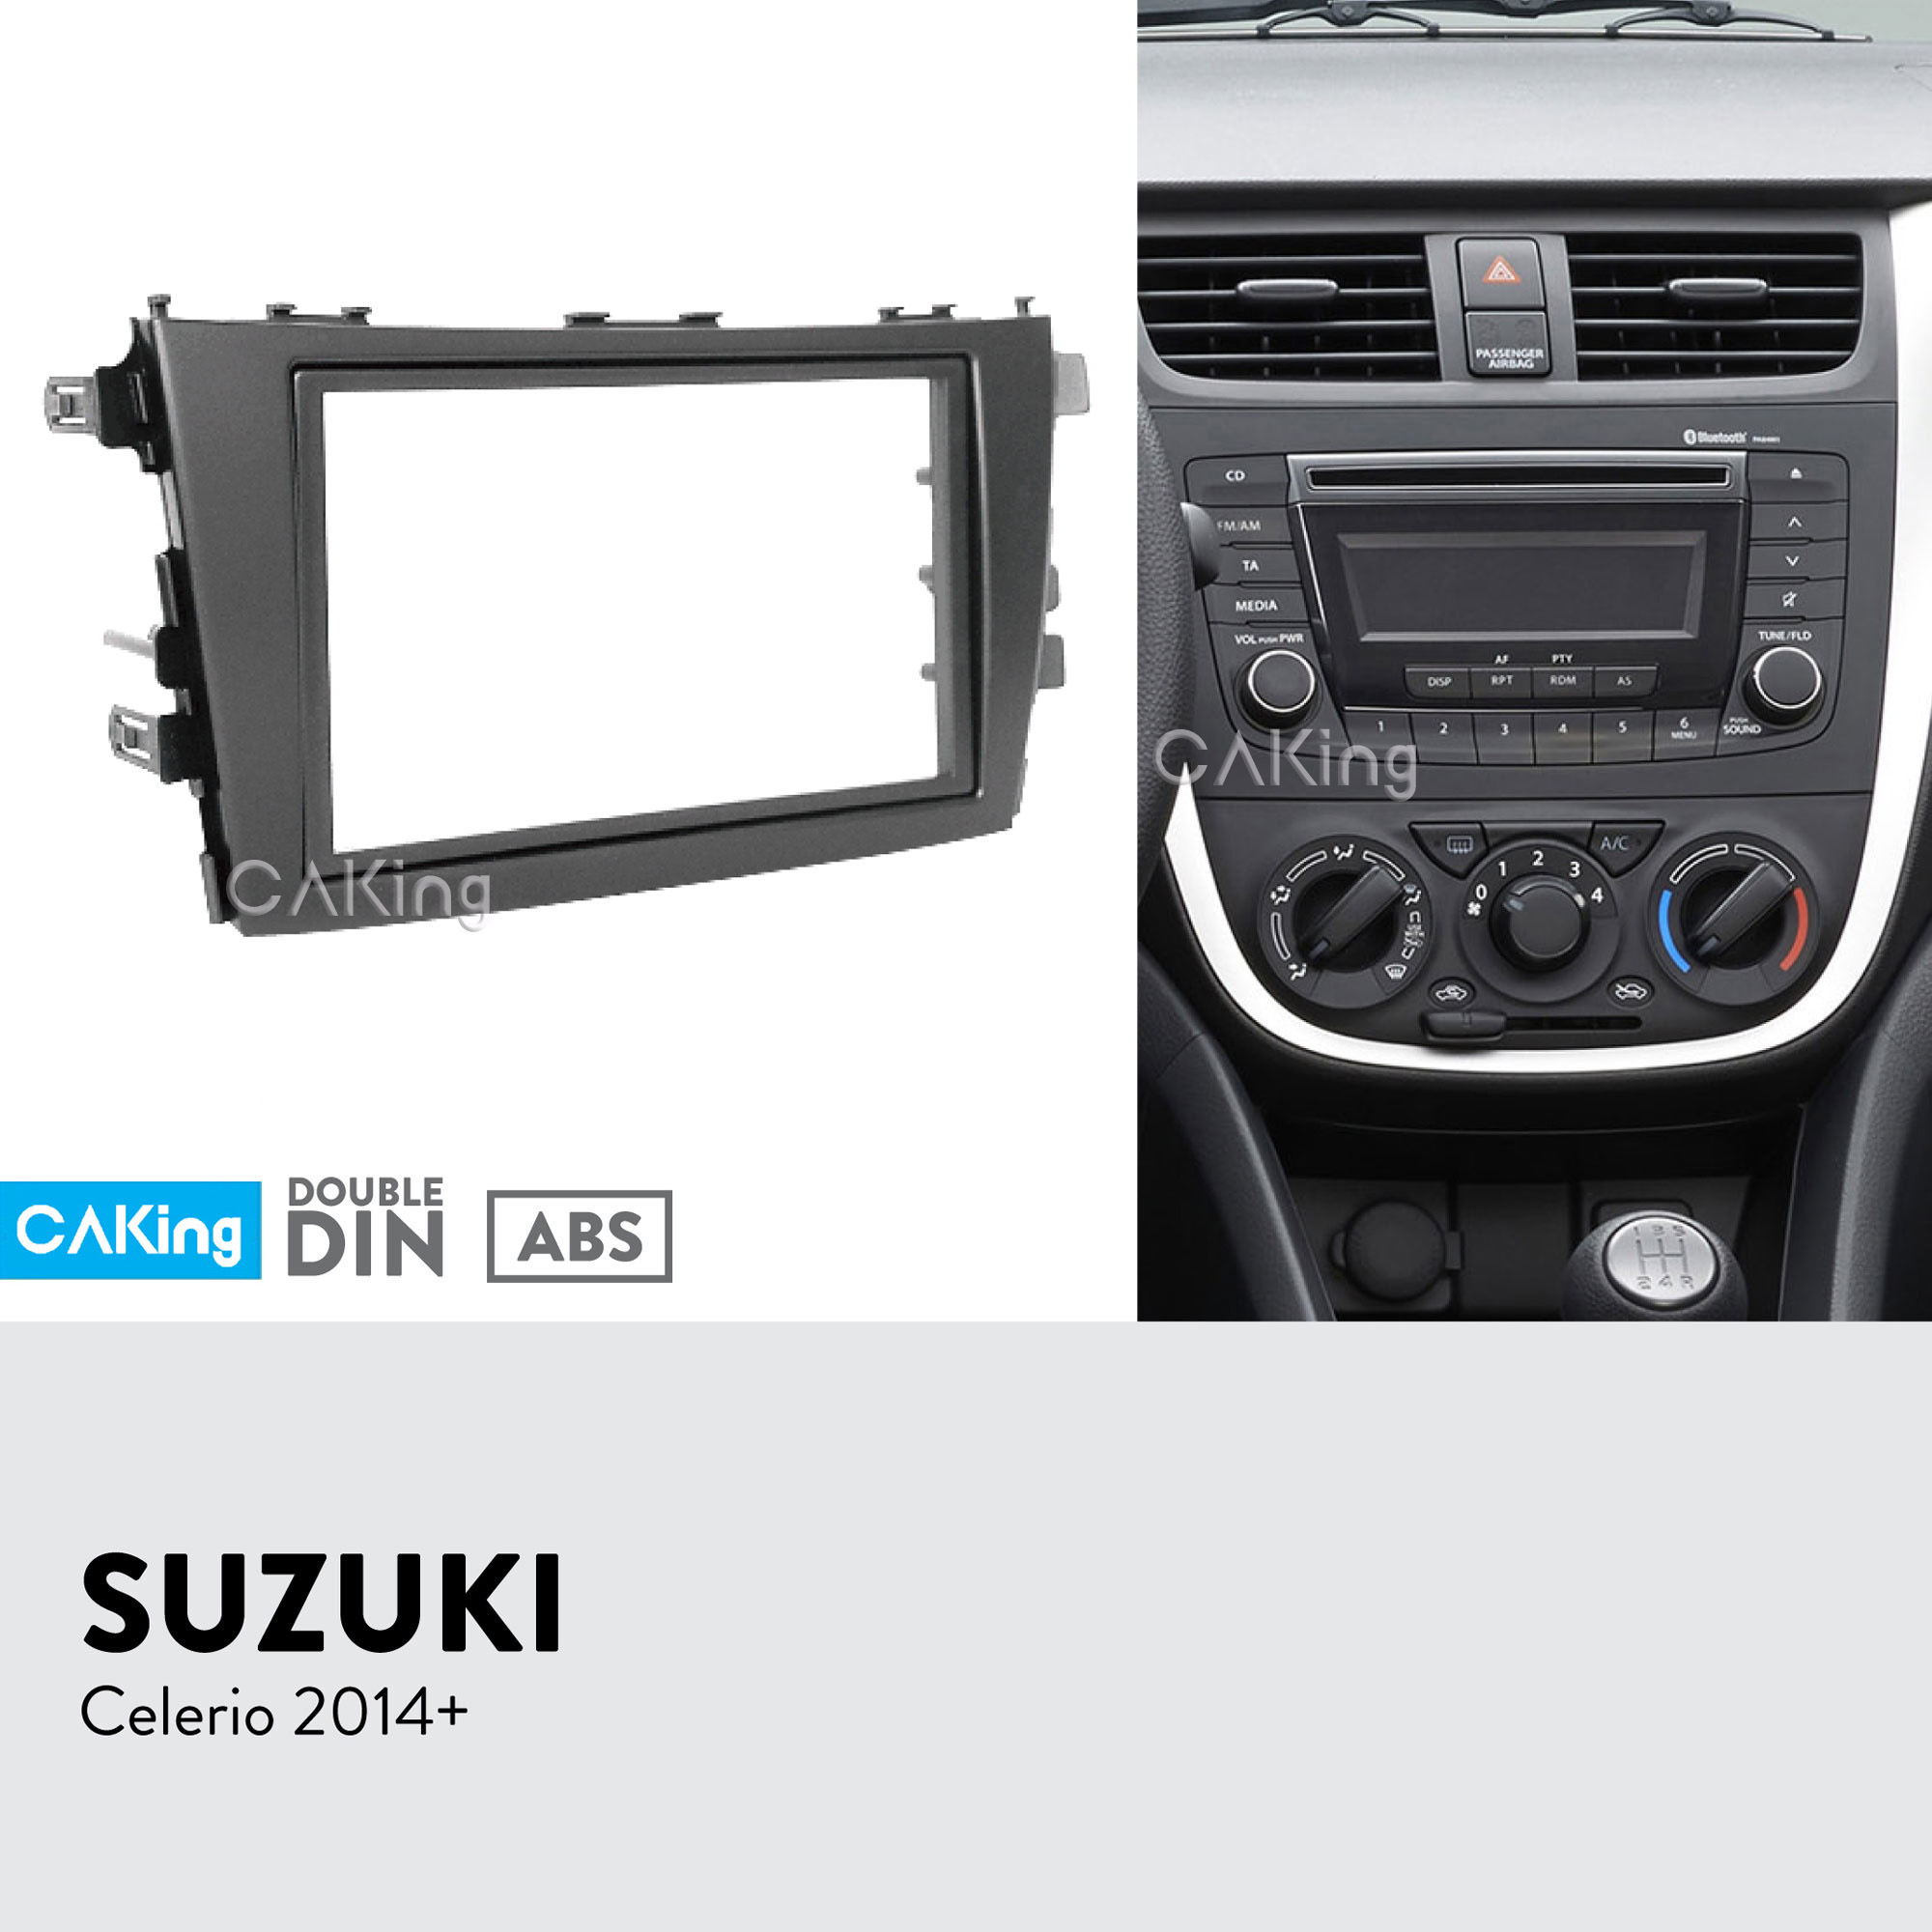 Double Din Car Fascia Radio Panel for SUZUKI Celerio 2014 Dash Fitting Kit Install Facia Plate